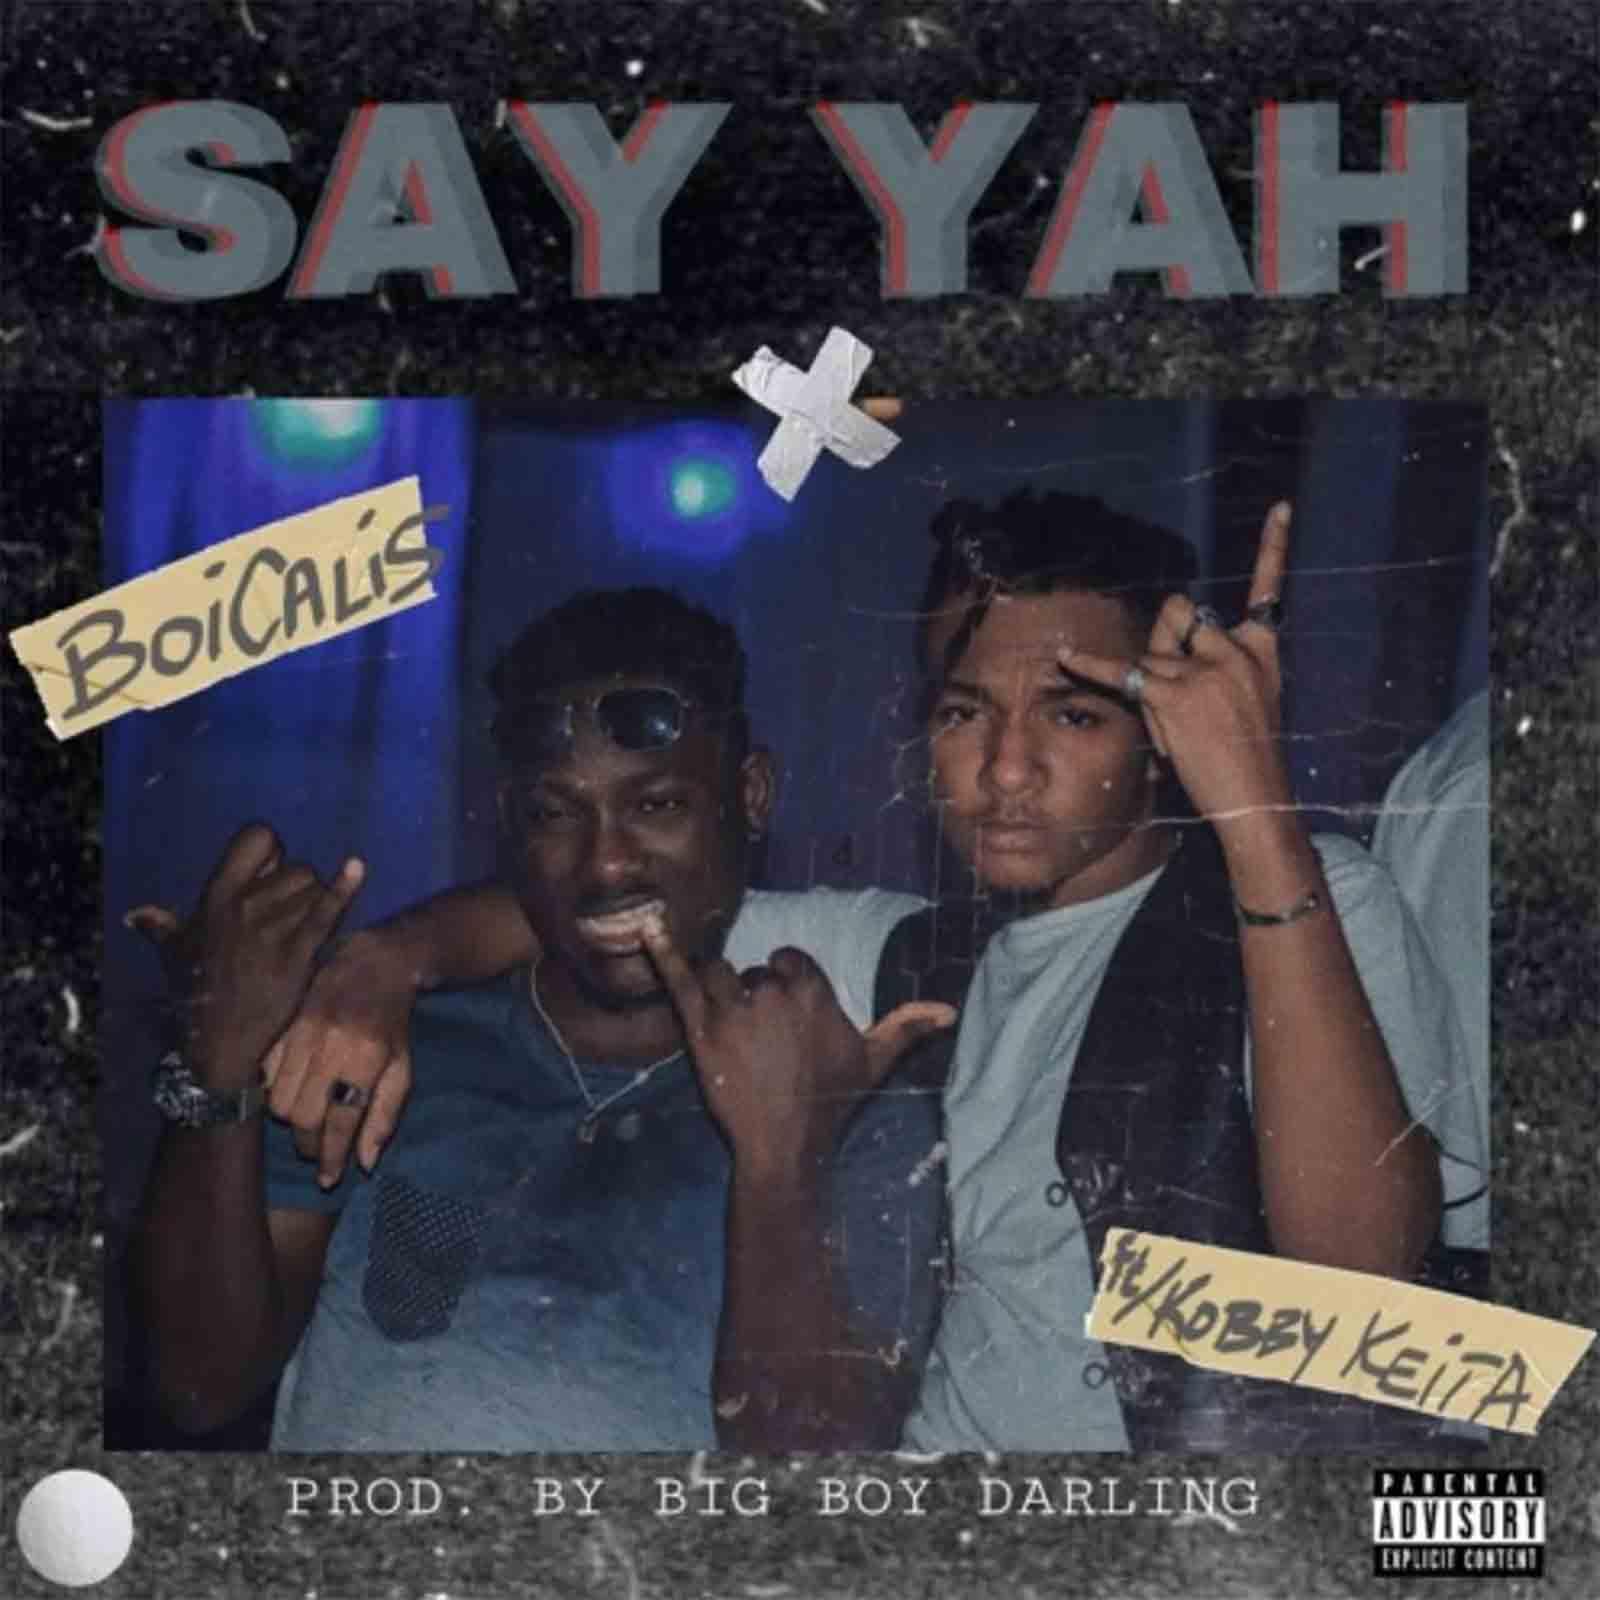 Say Yah by Boicalis feat. Kobby Keita